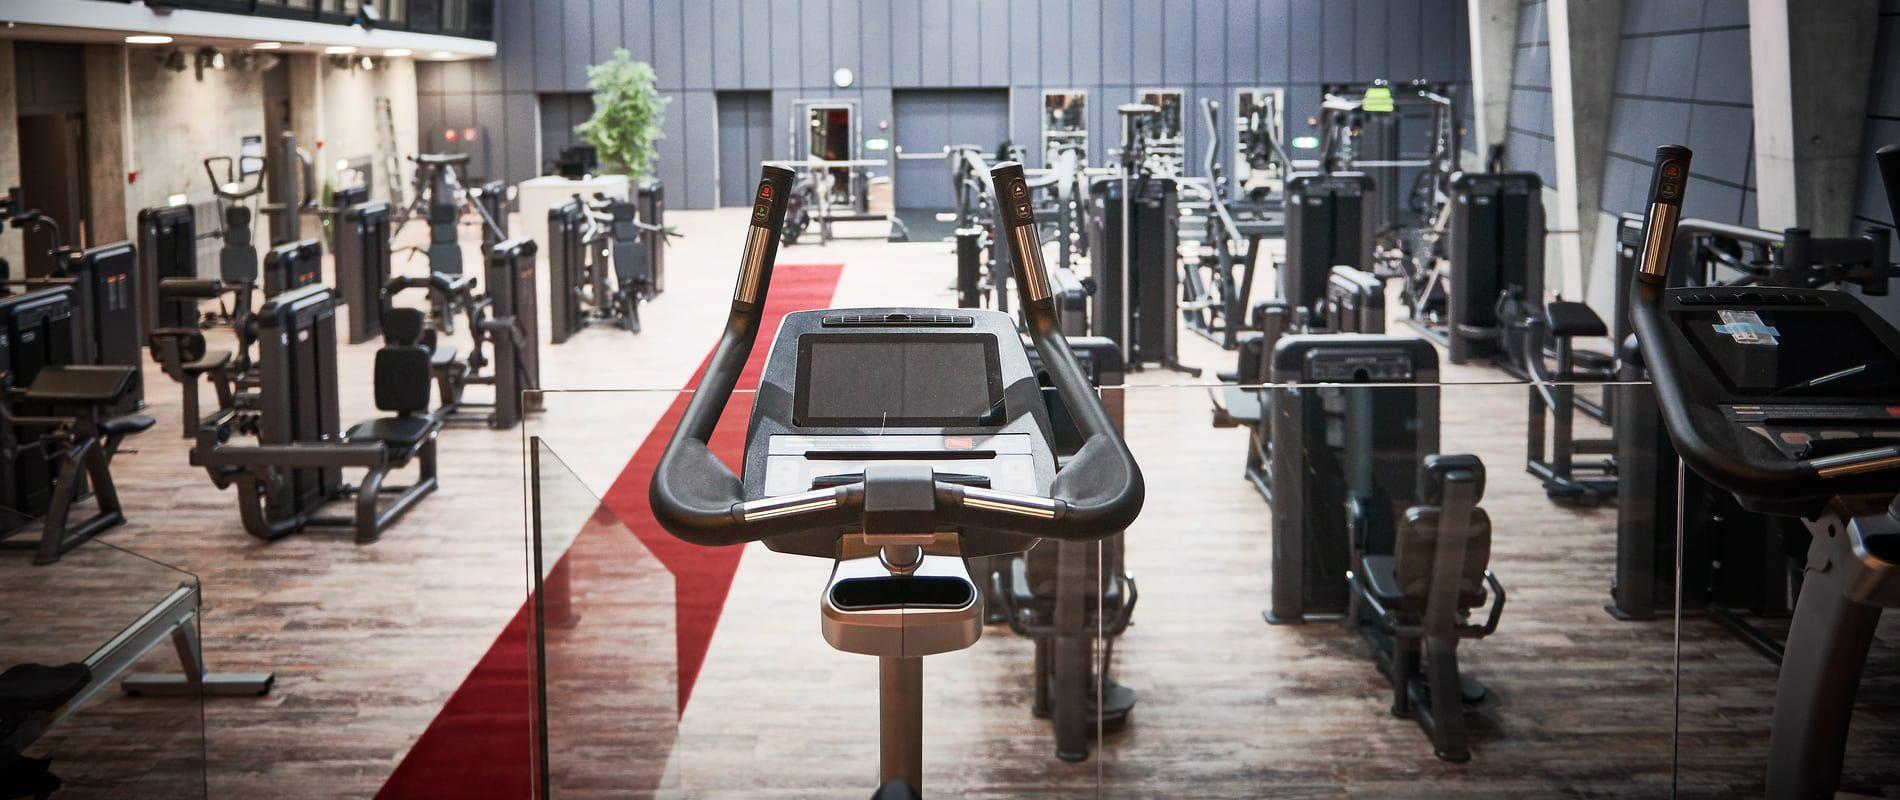 update Fitness Basel Gundeli - Ausdauerbereich